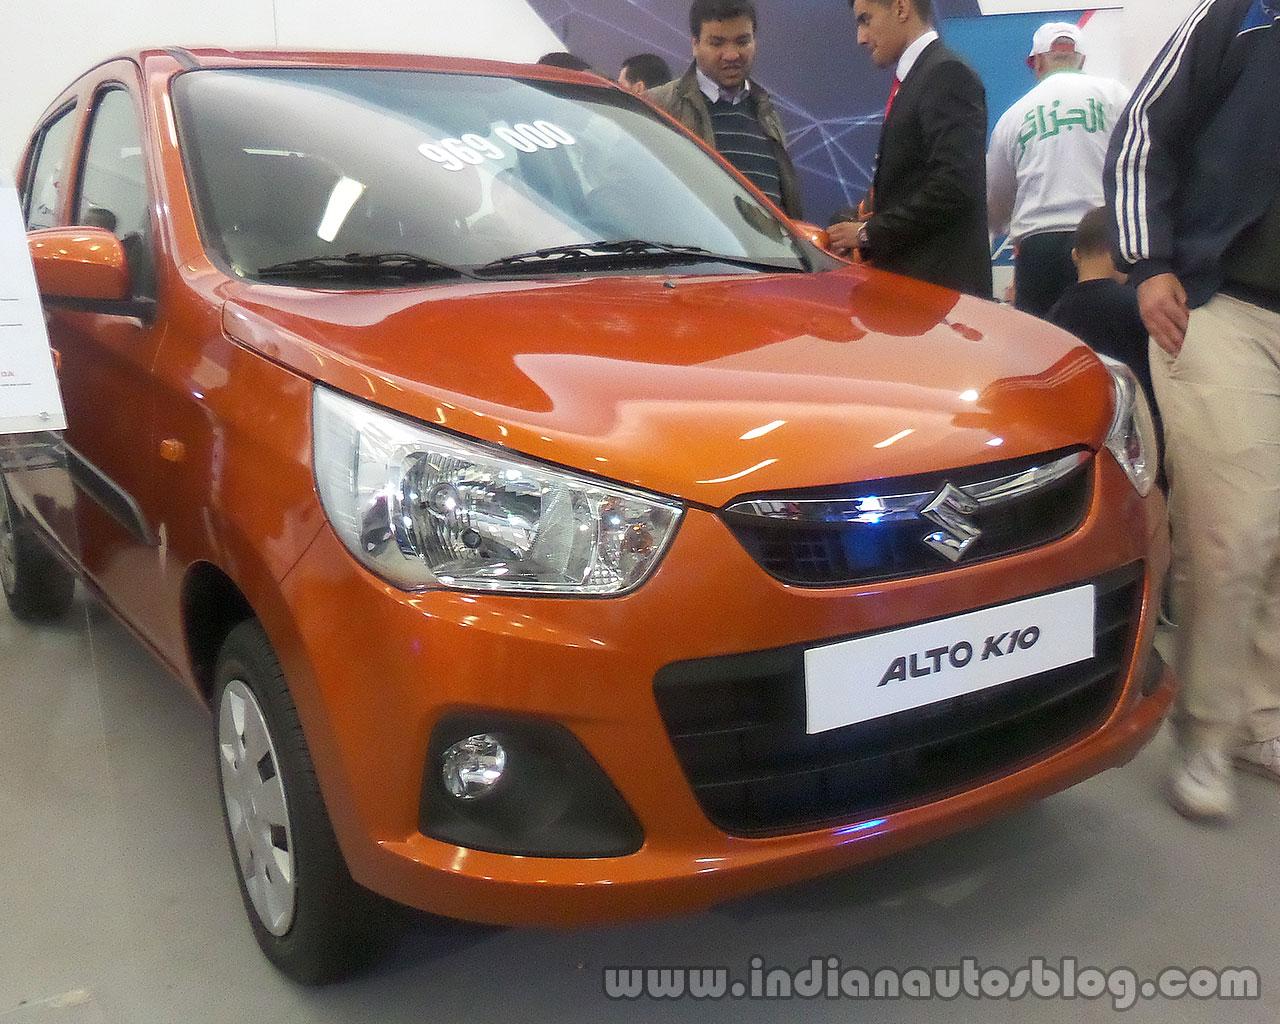 Suzuki-K10-front-quarter-view-at-Algeria-Motor-Show